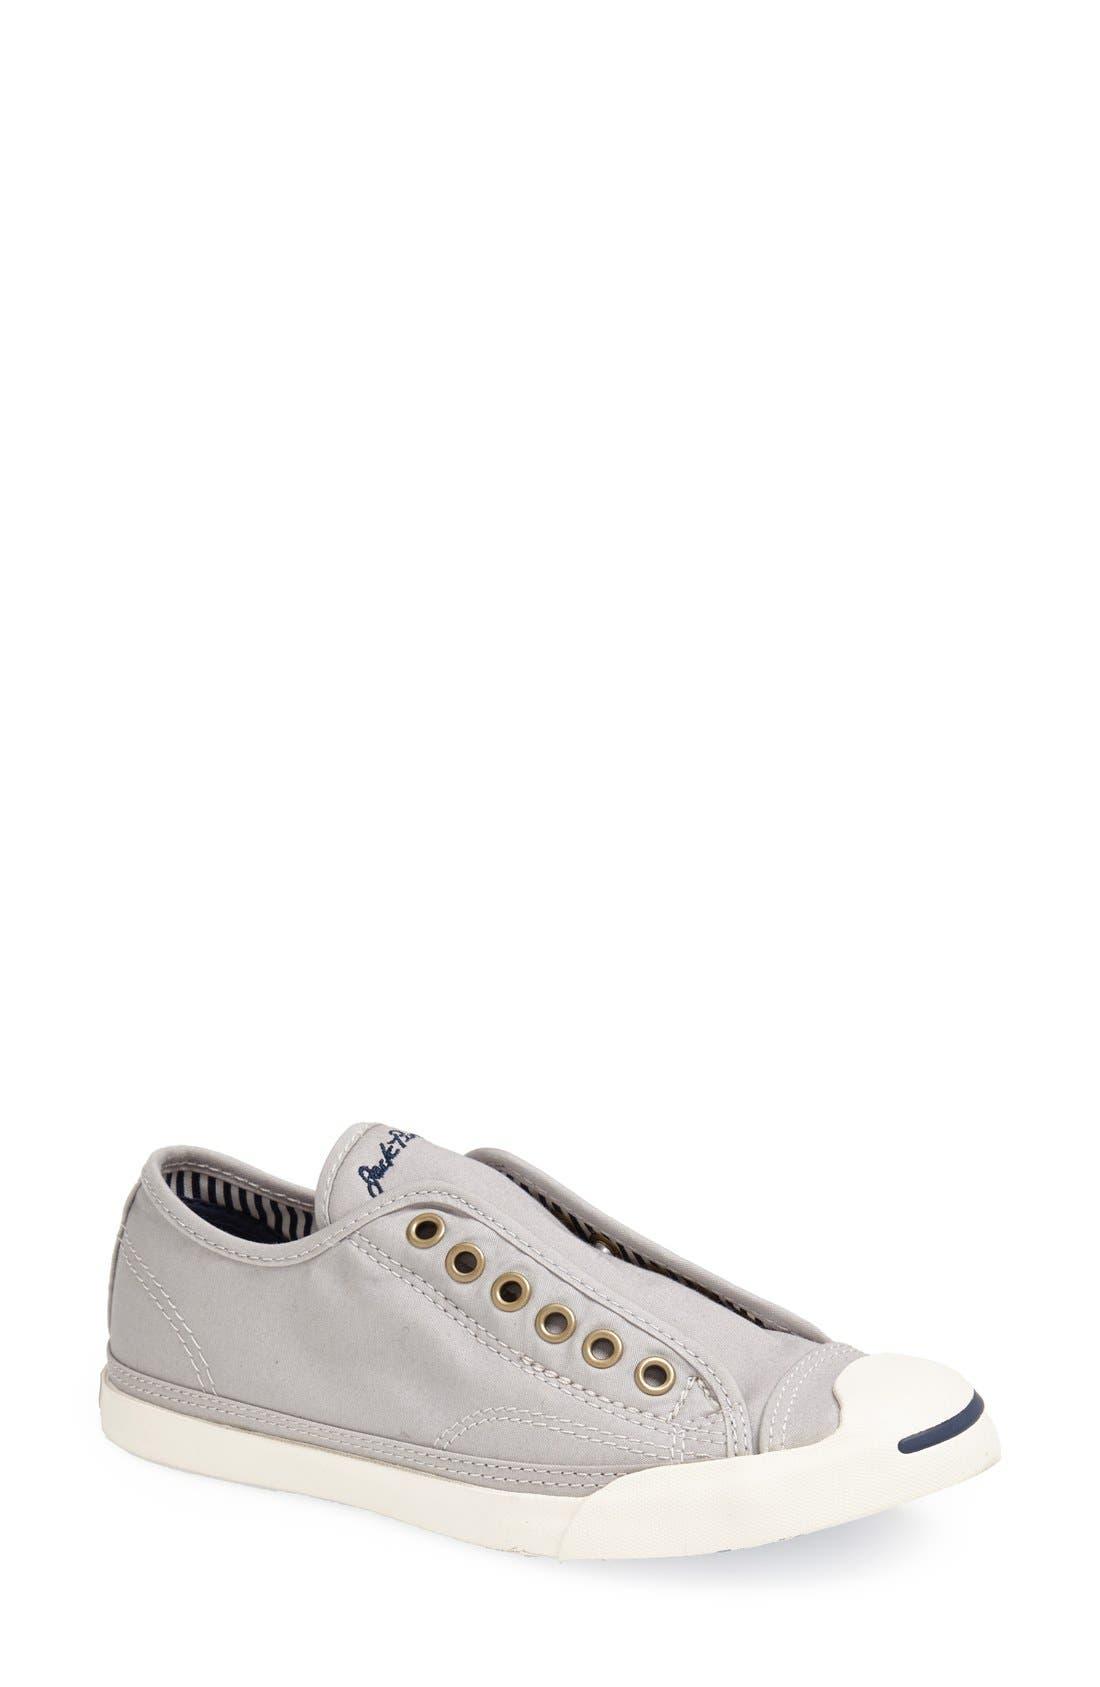 Main Image - Converse 'Jack Purcell LP' Sneaker (Women)